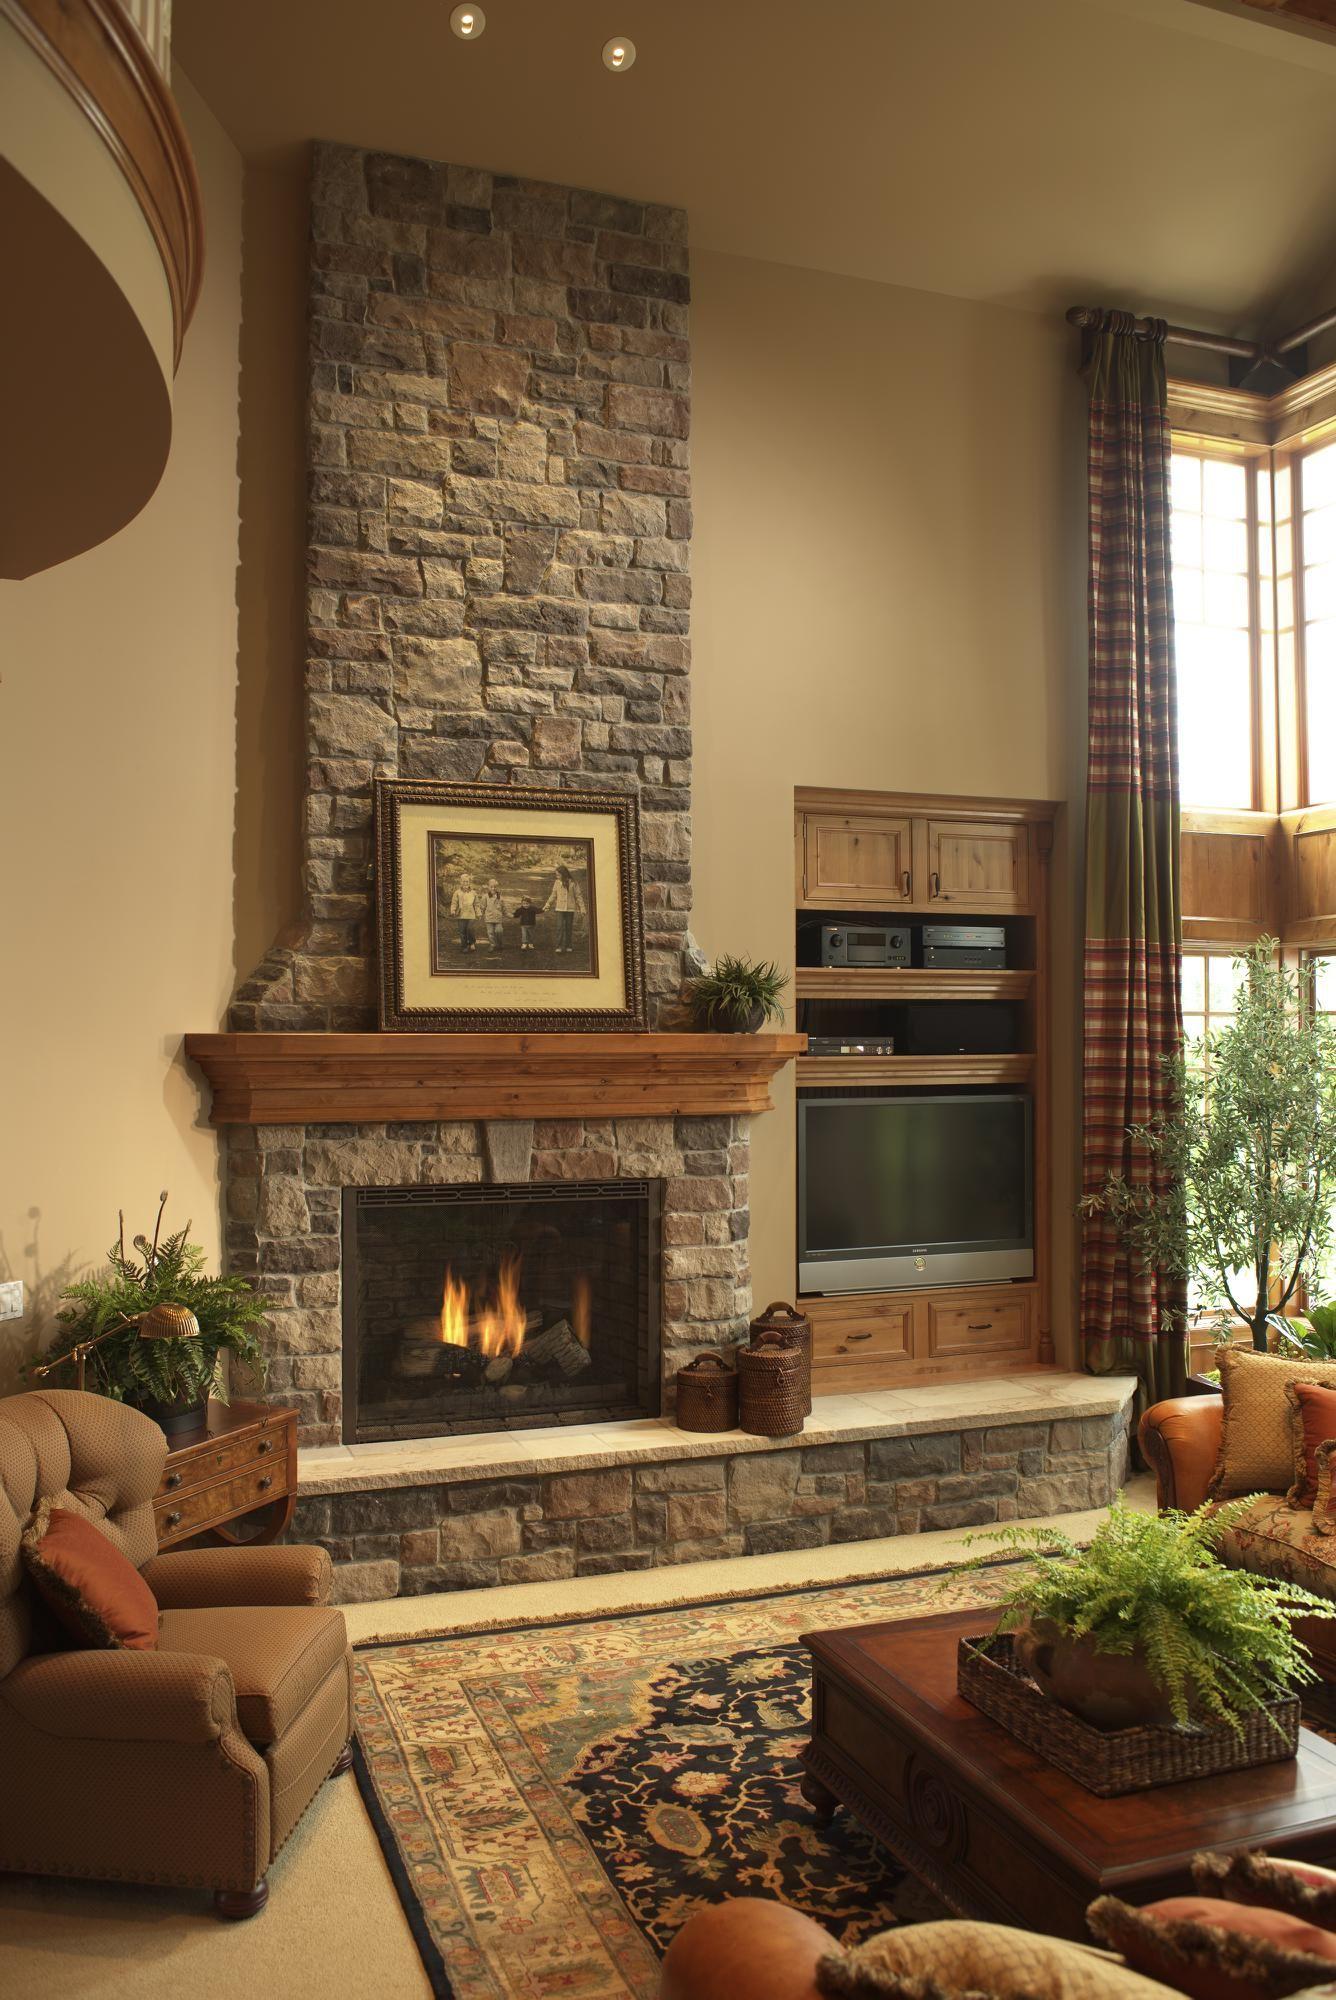 Eldorado Stone Imagine Inspiration Gallery Residential Fireplaces Stone Fireplace Designs Home Fireplace Fireplace Design